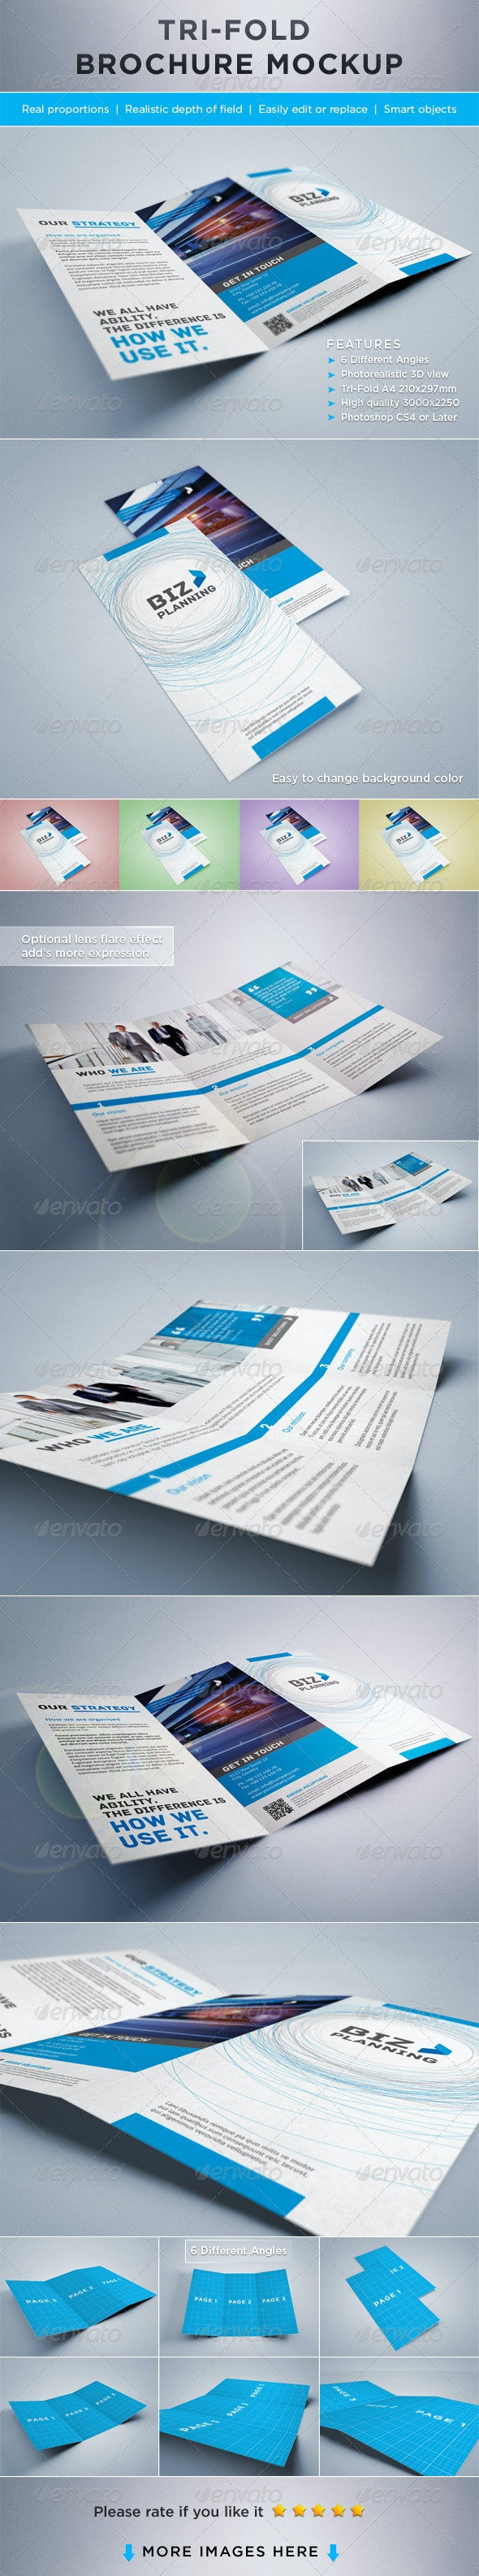 Photorealistic Tri-Fold Brochure Mock-ups - Brochures Print